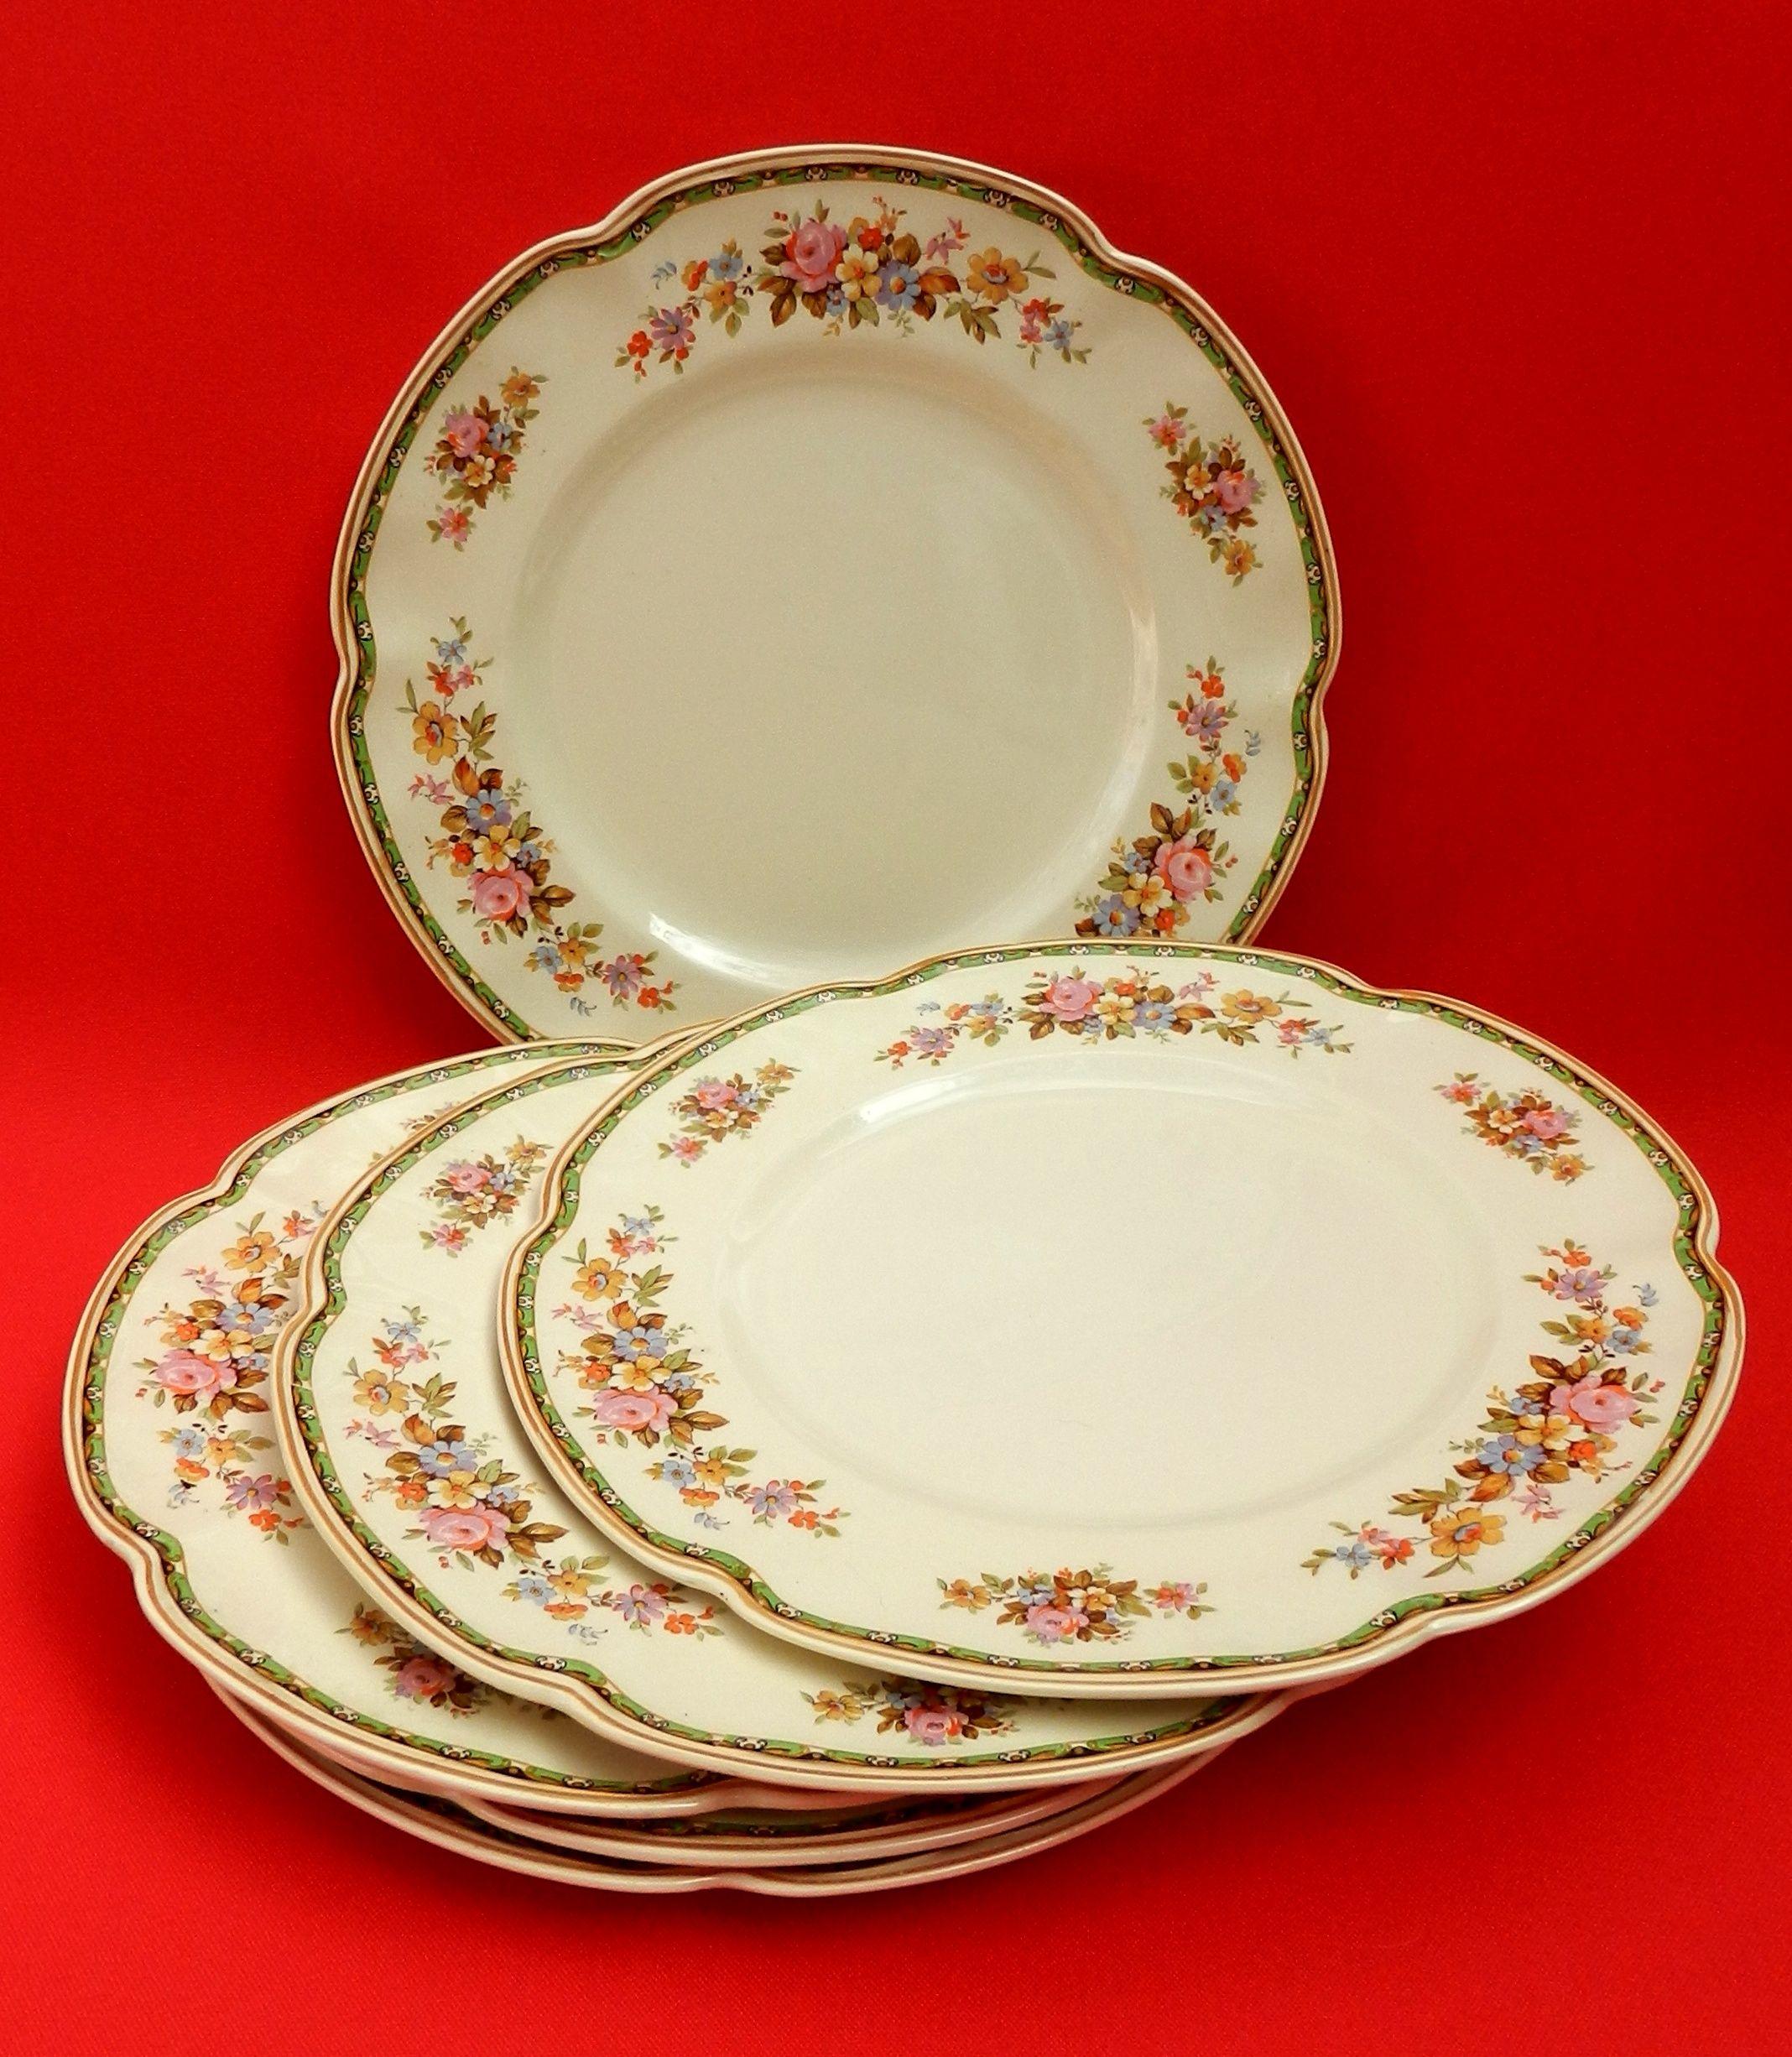 Victorian johnson bros england juego de seis platos playos en loza inglesa pintura art - Johnson brothers vajilla ...